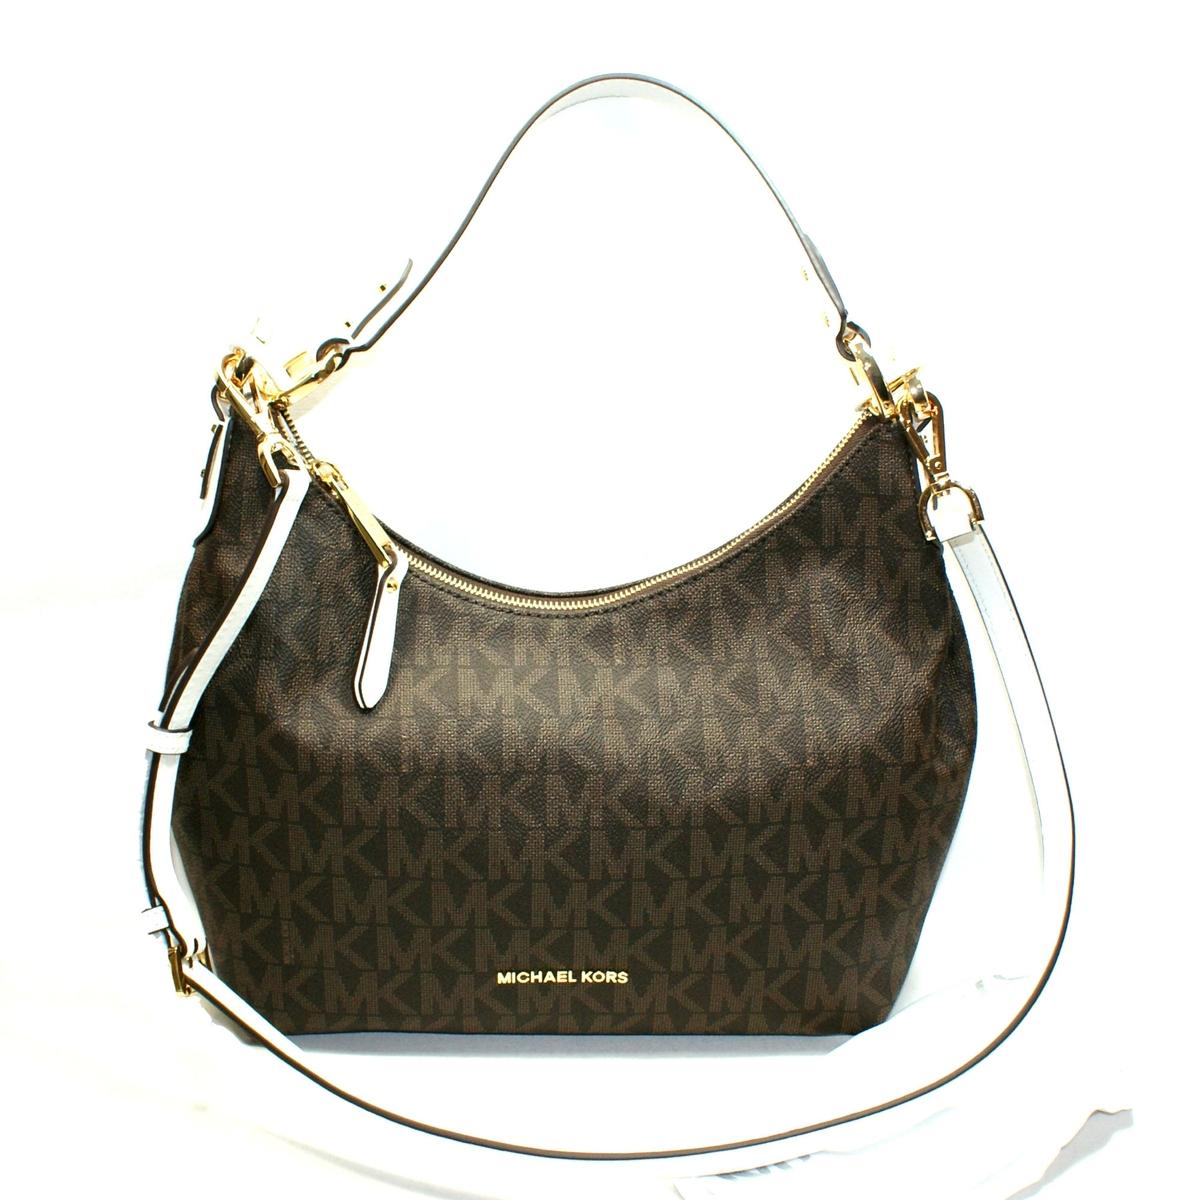 ff55e9da5e6f Home · Michael Kors · Isabella Medium Convertible Shoulder Bag White. CLICK  THUMBNAIL TO ZOOM. Found ...